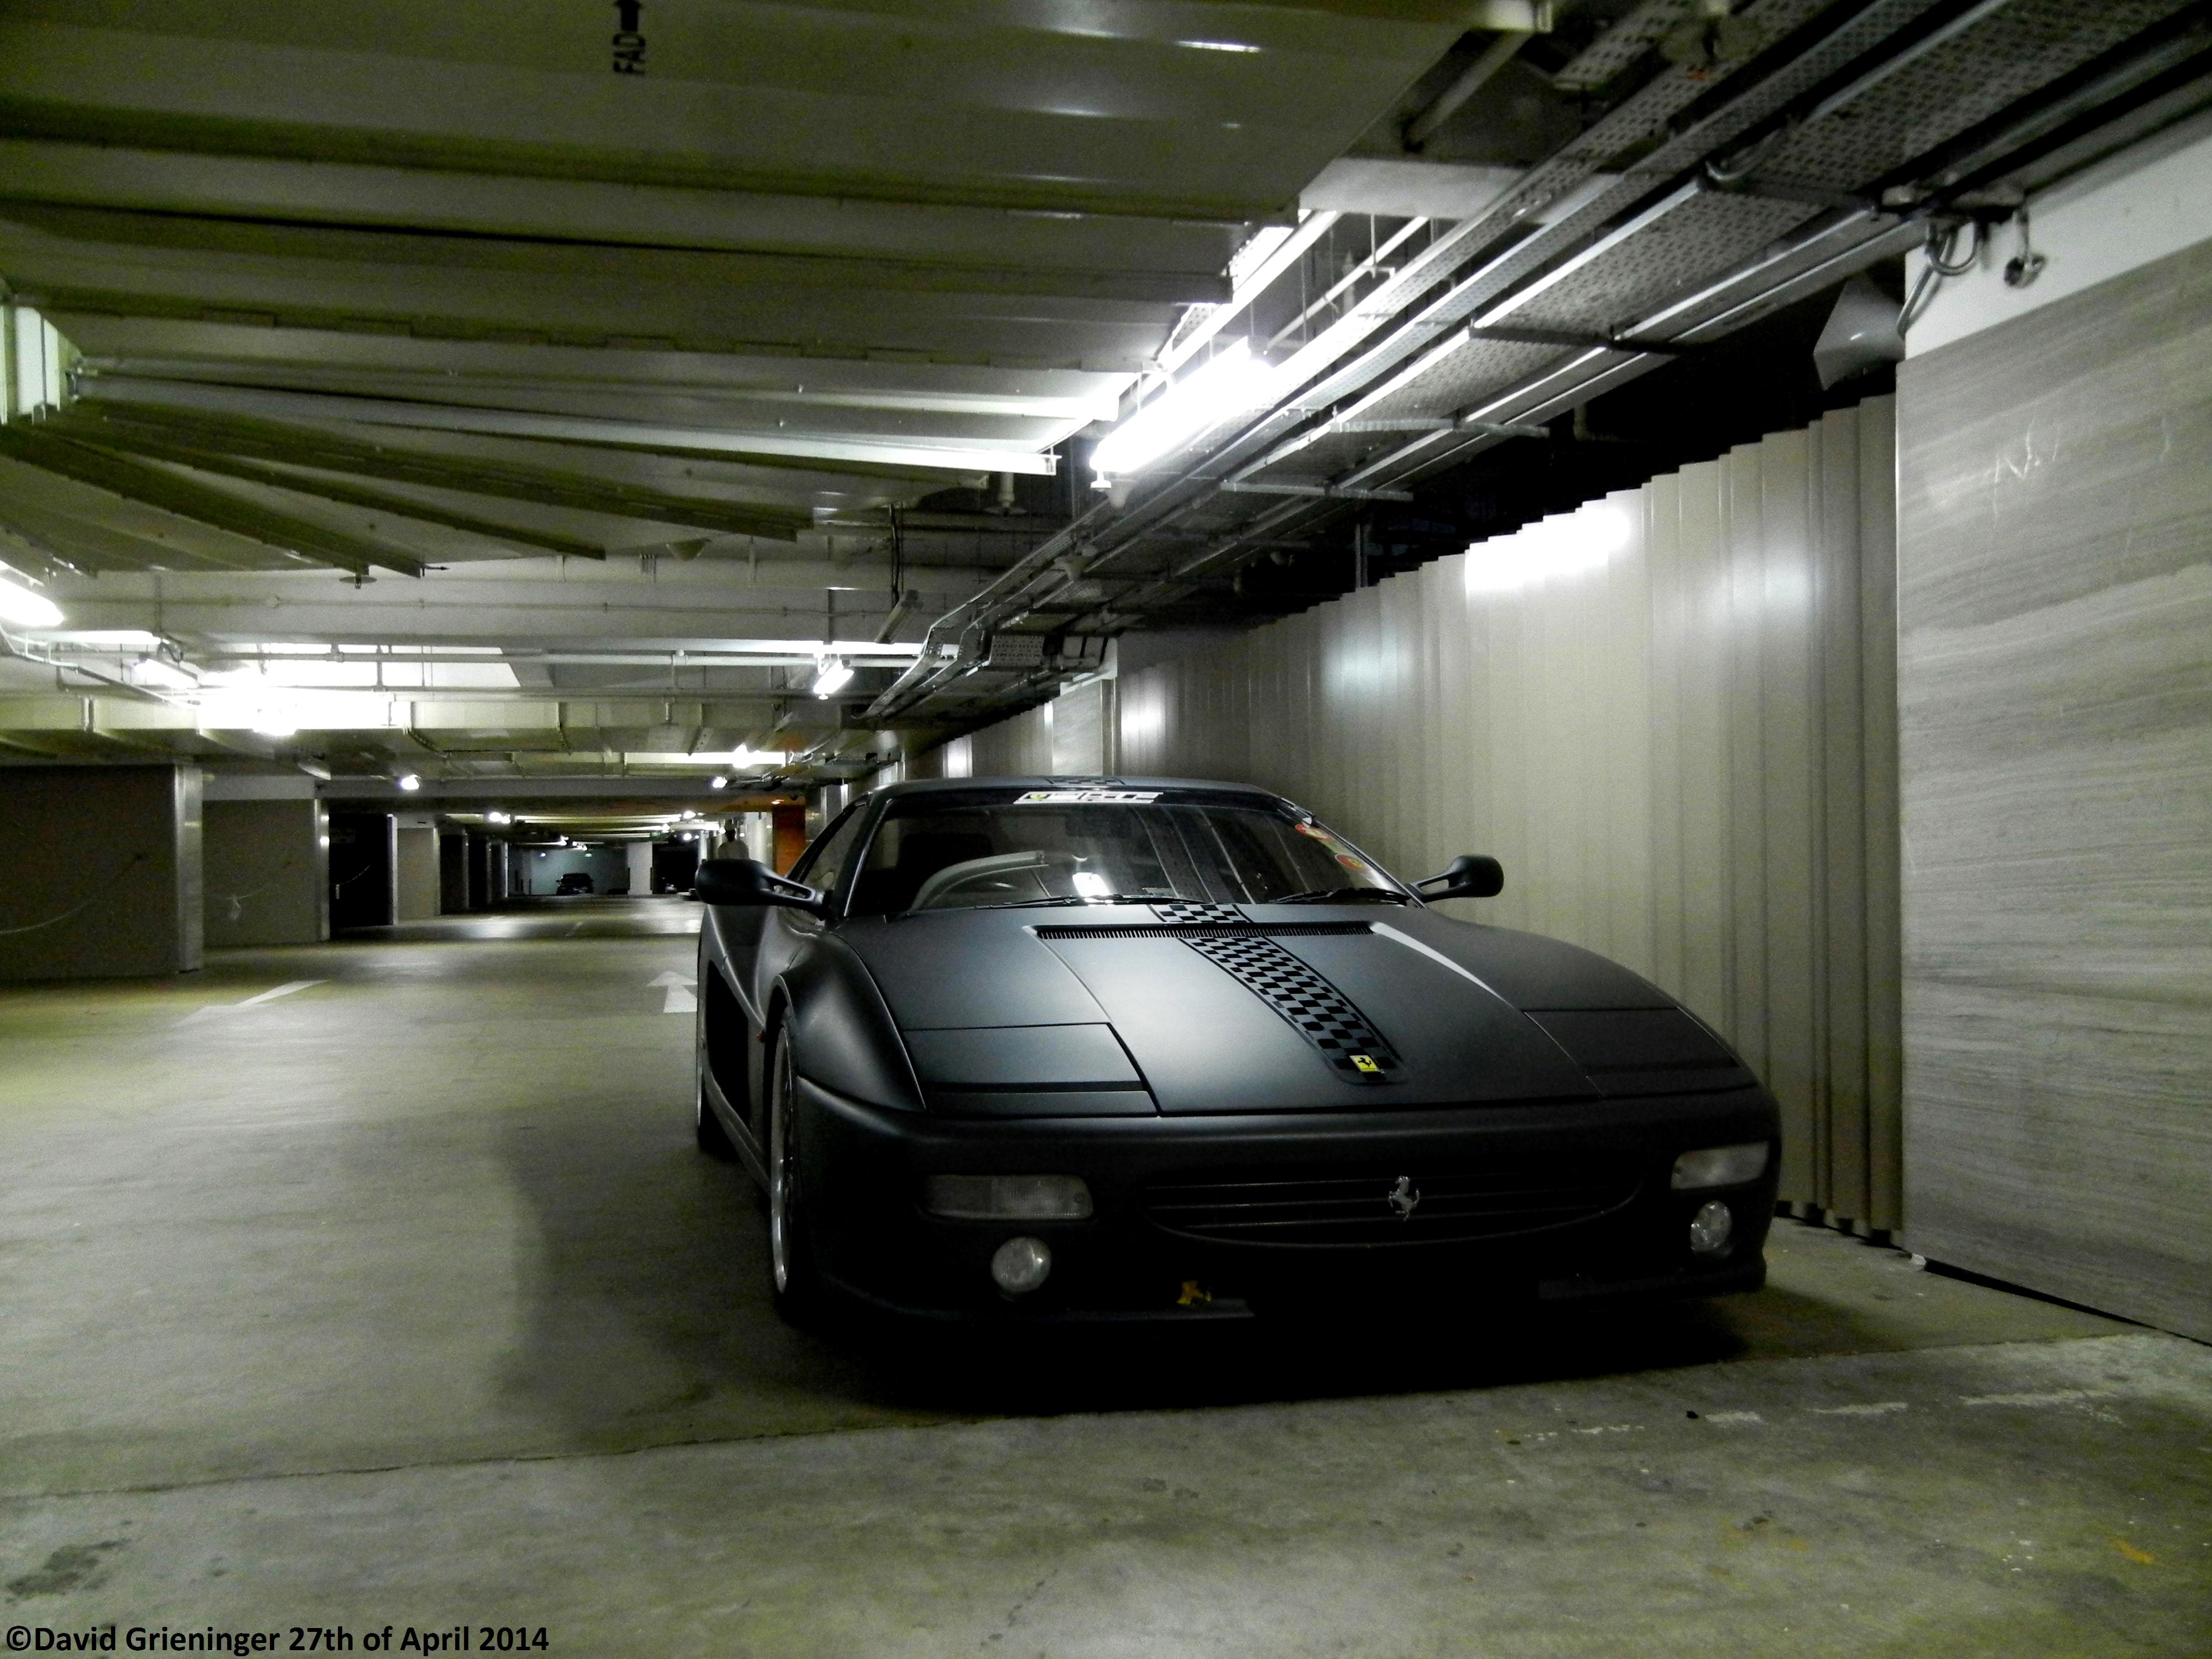 Ferrari Testarossa by DavidGrieninger